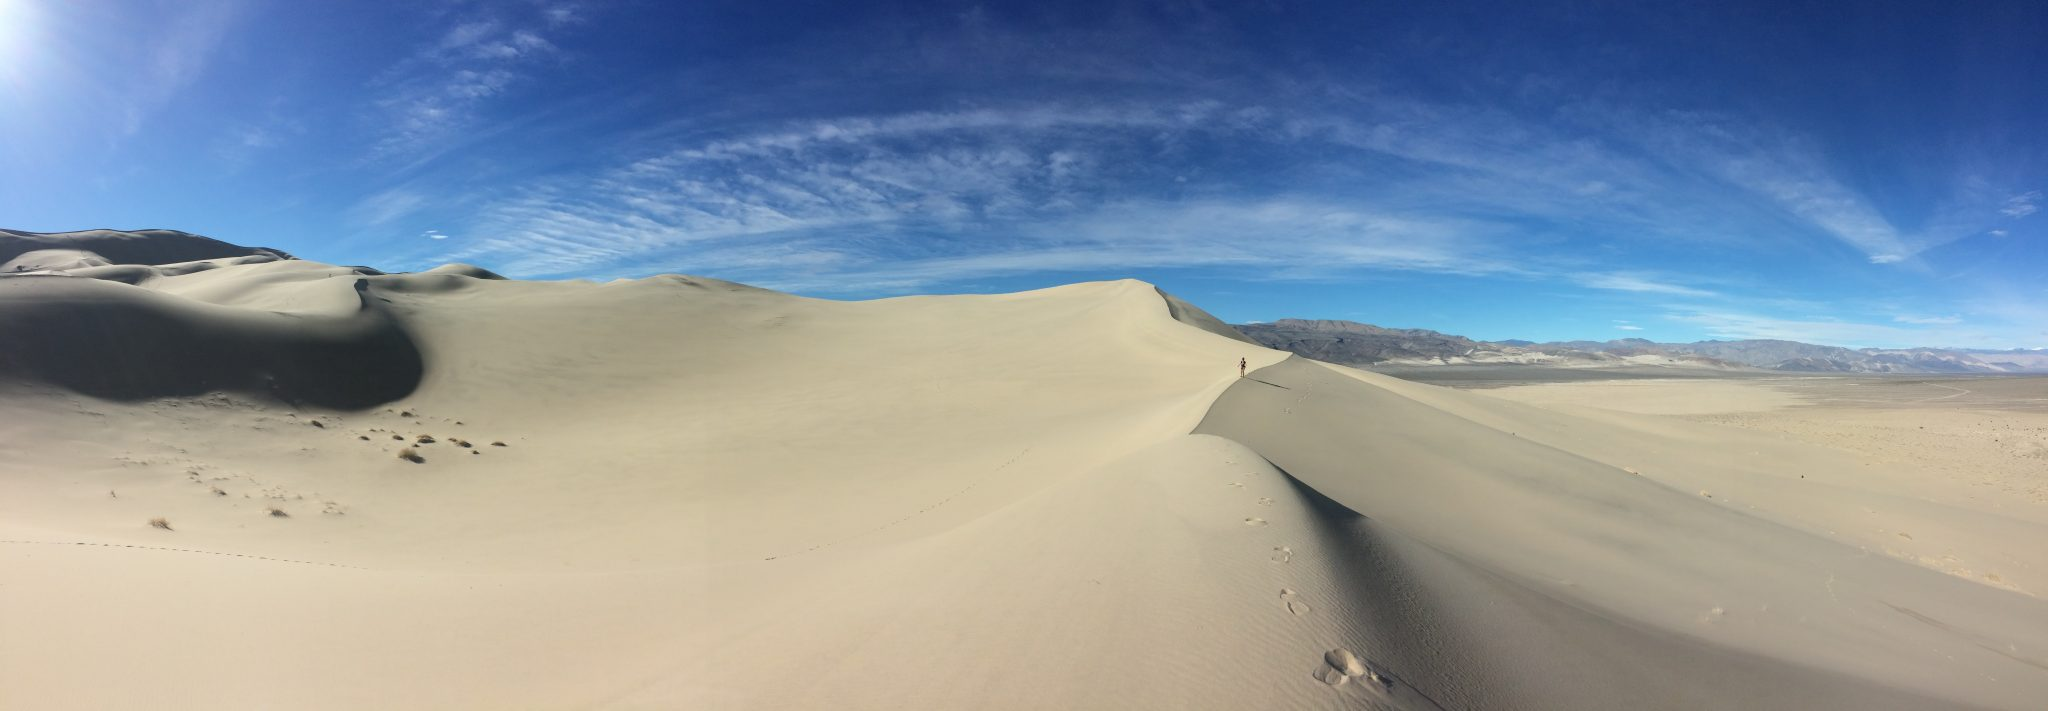 Eureka Dunes death valley with hiker